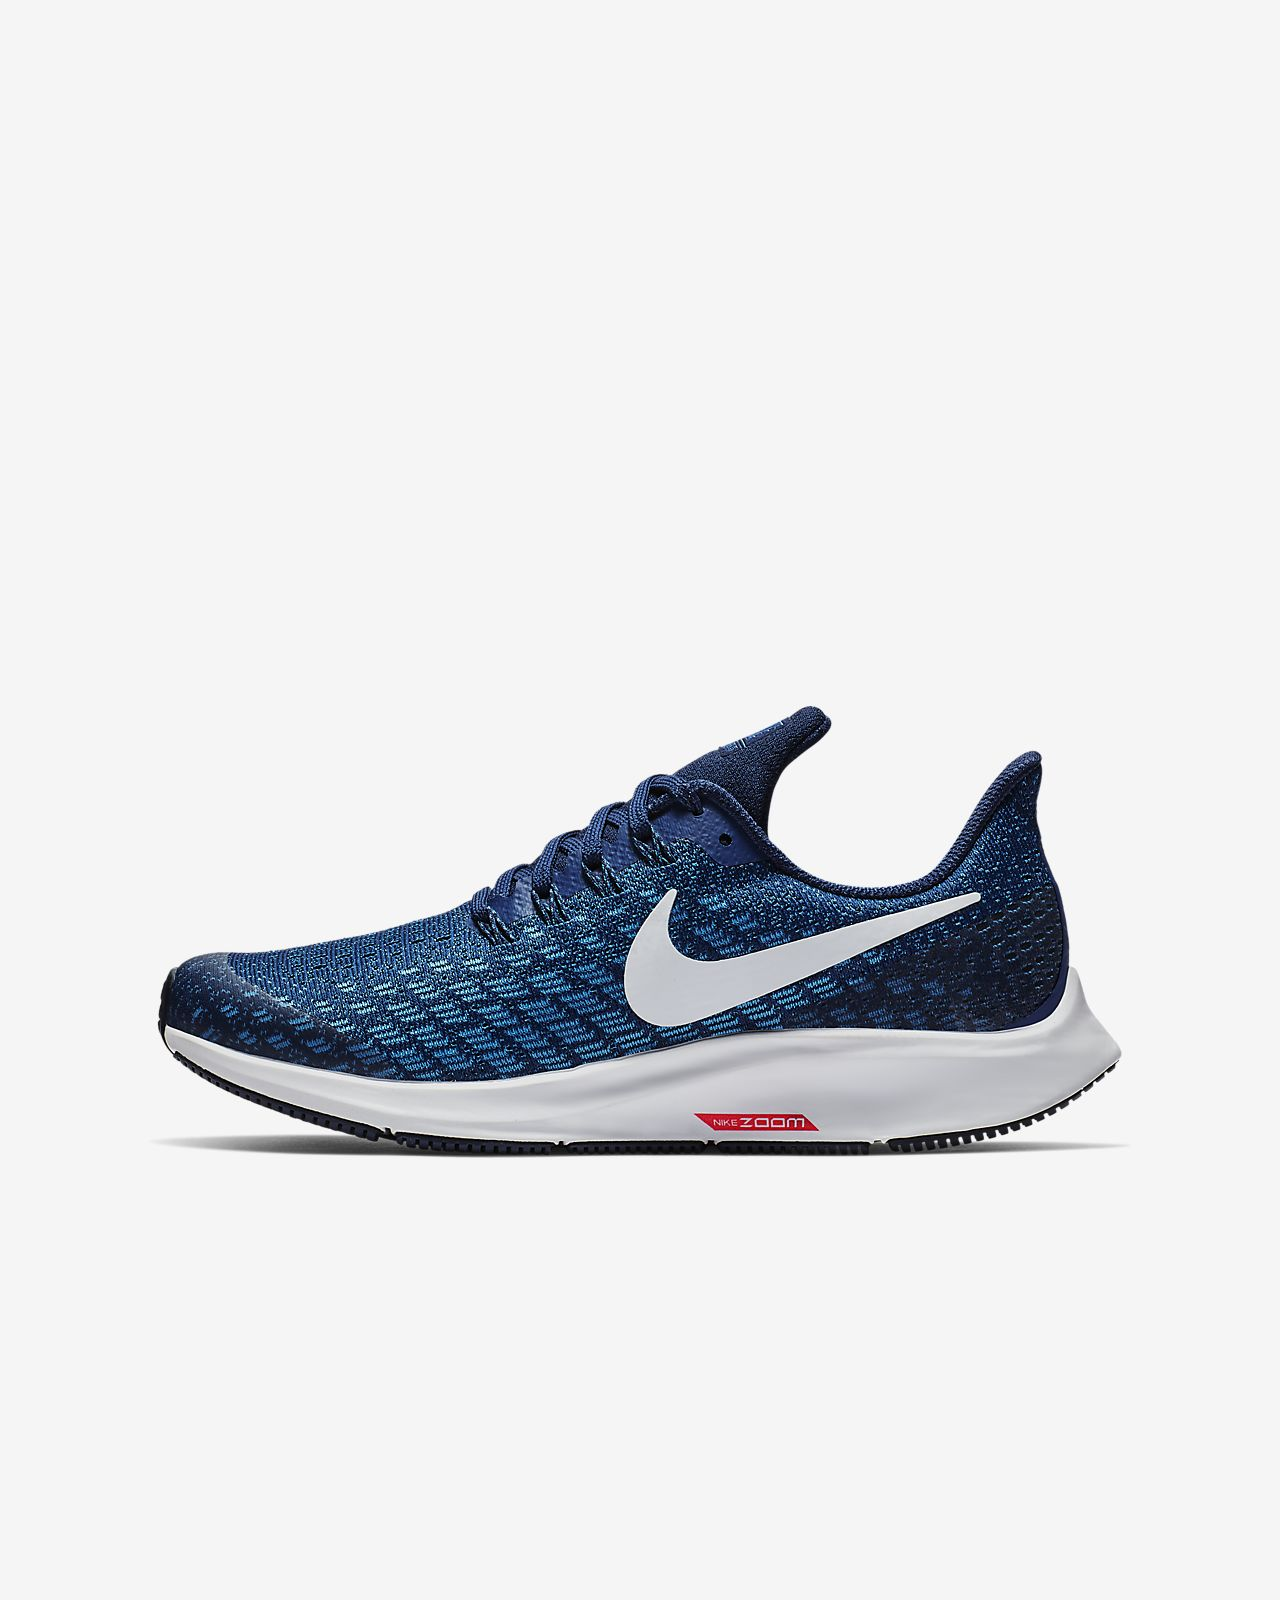 Calzado de running para niños talla pequeña/grande Nike Air Zoom Pegasus 35